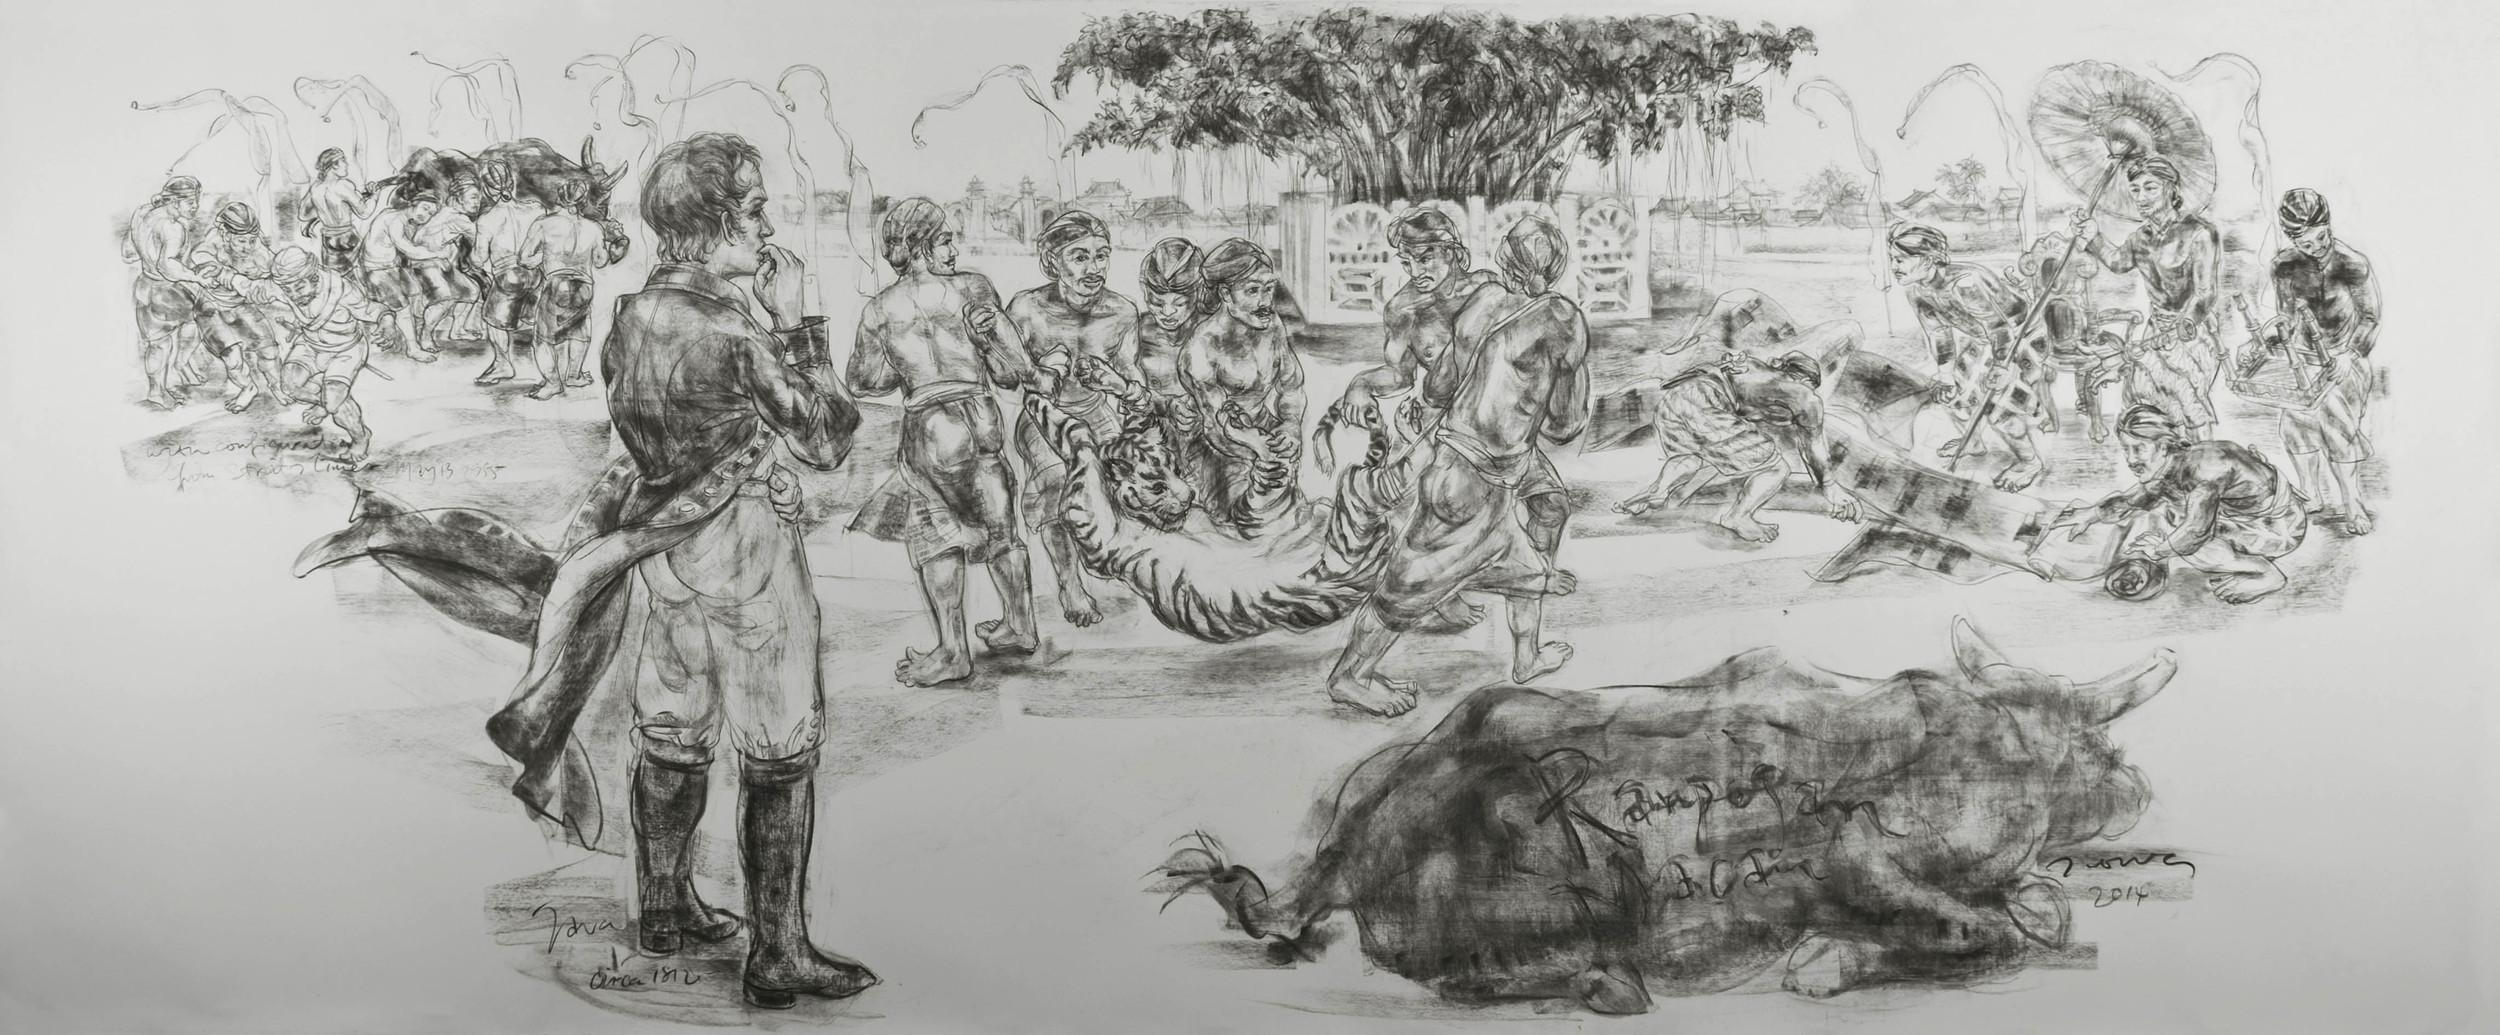 Rampogan Macan  2014 Charcoal on paper 128 x 313 cm (paper)